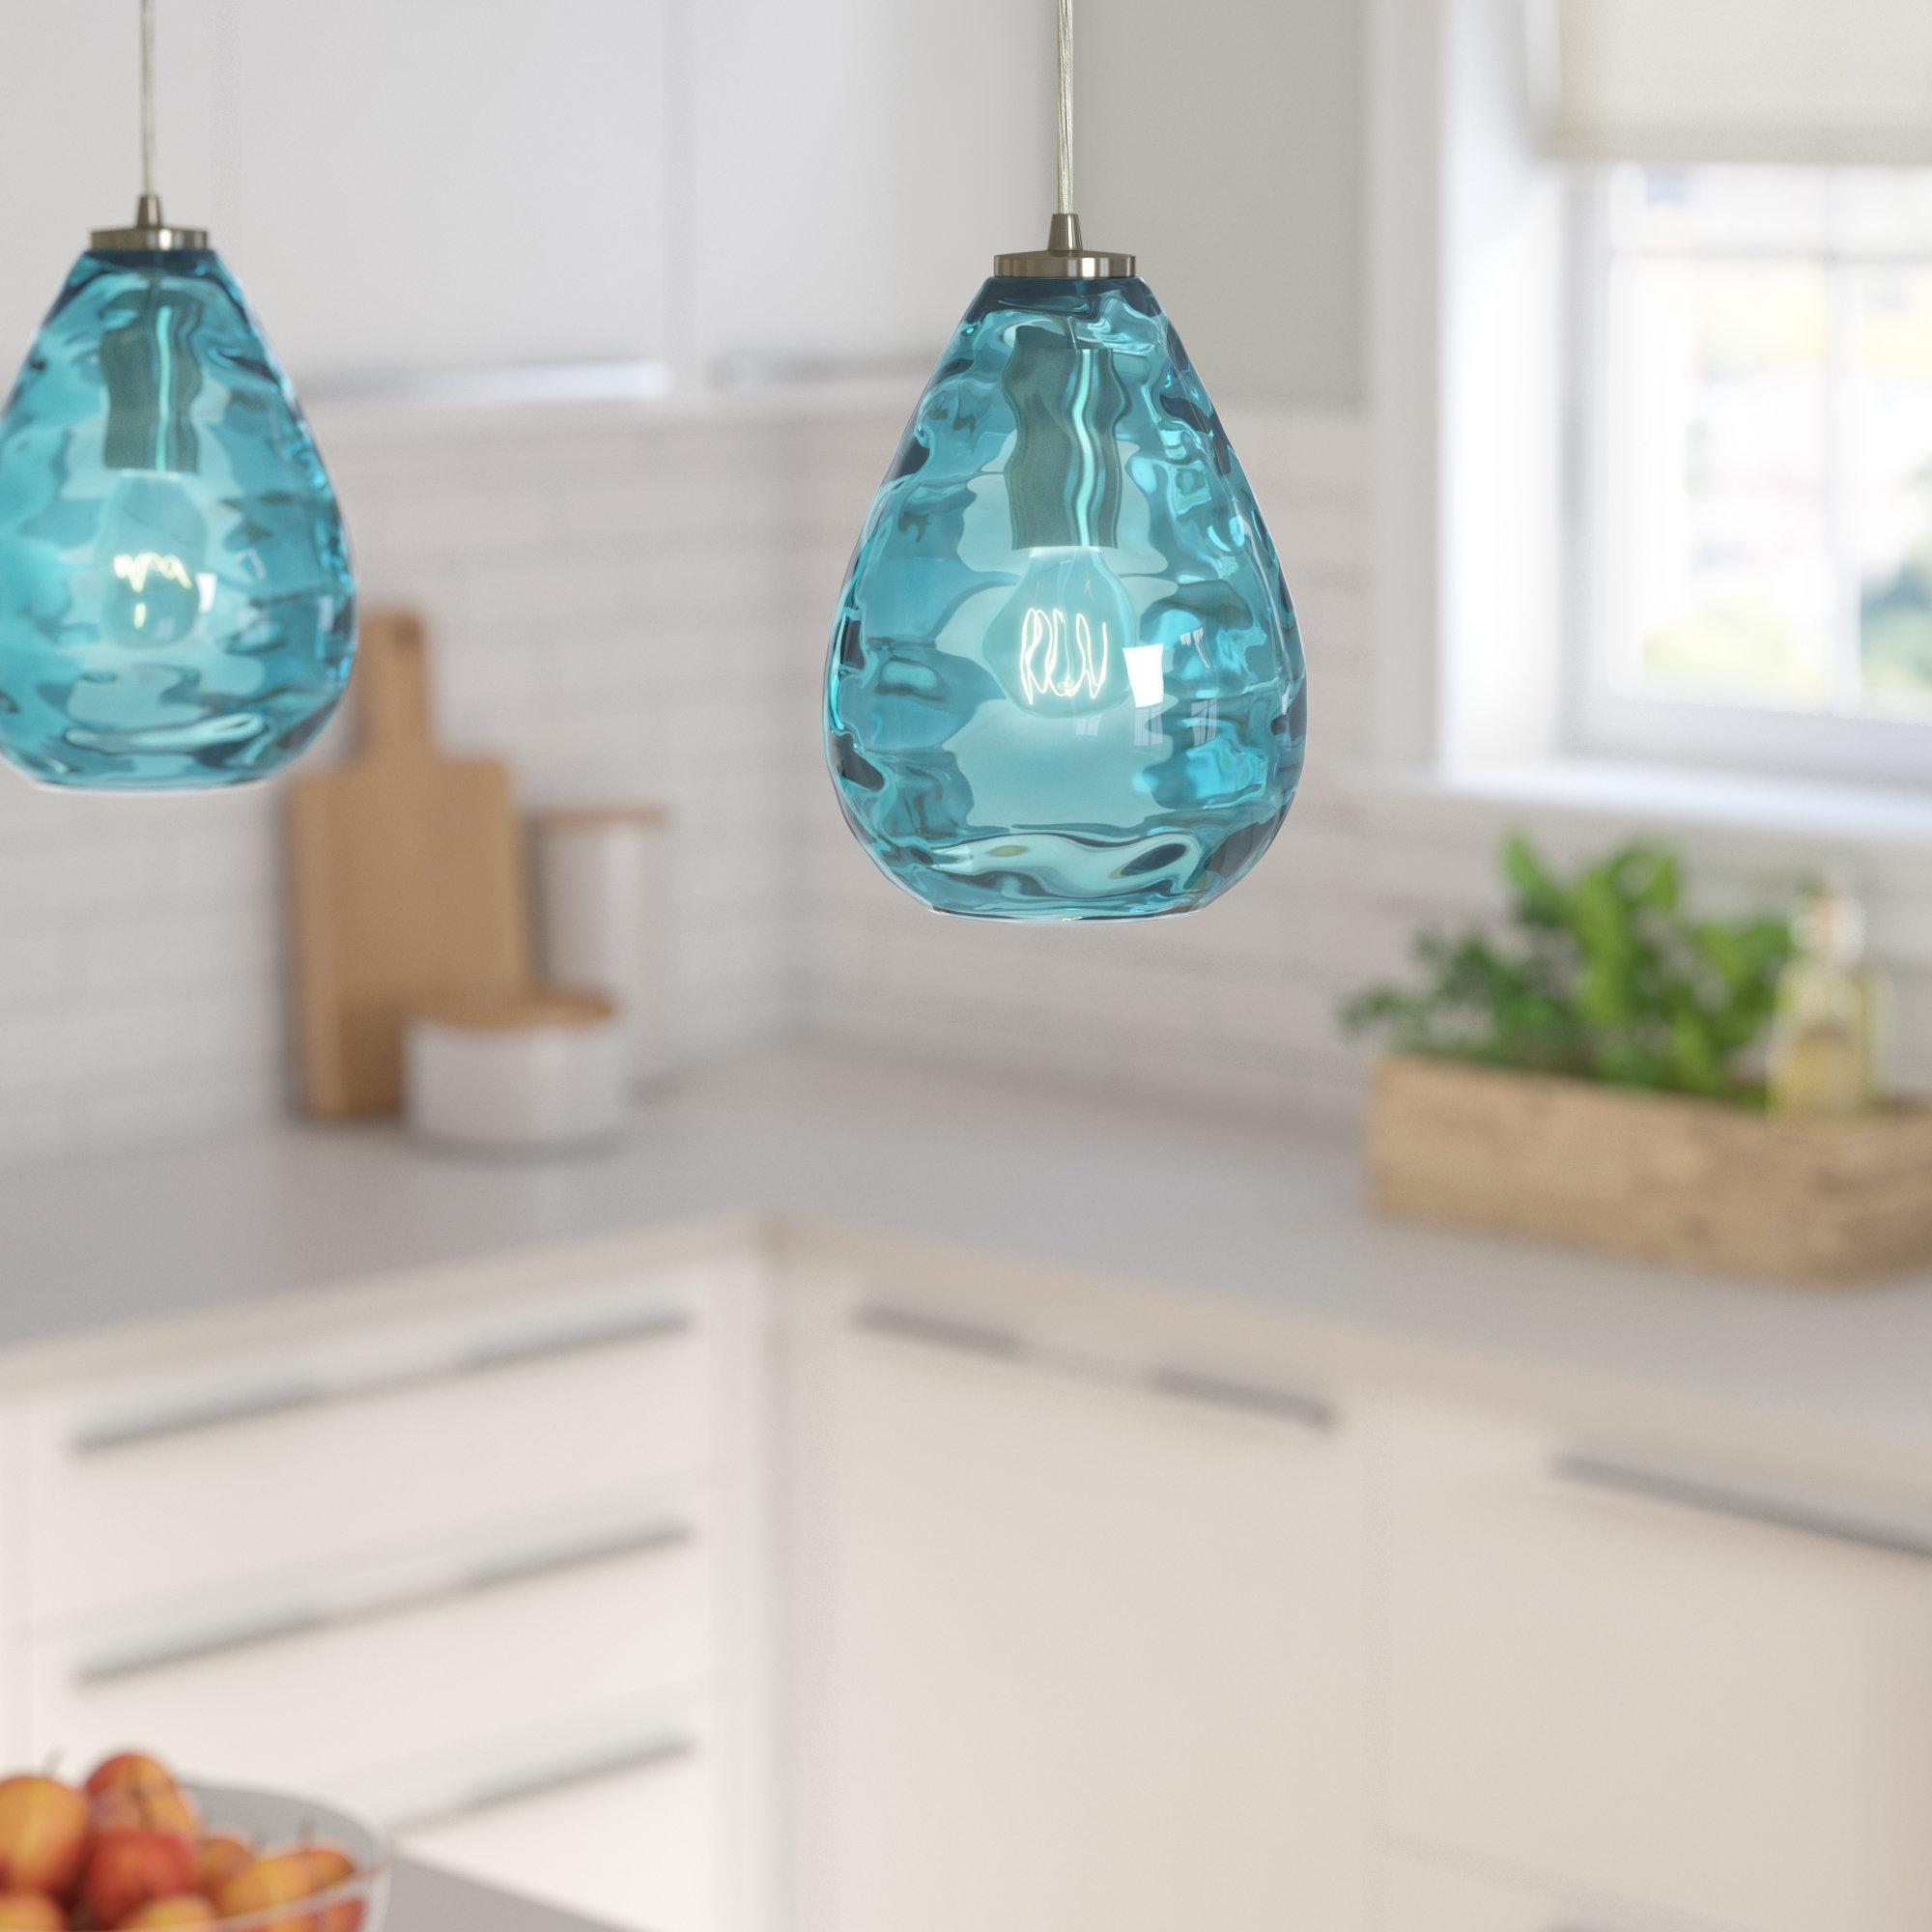 Aluminum Cone Pendant Lighting | Wayfair Regarding Guro 1 Light Cone Pendants (View 24 of 30)